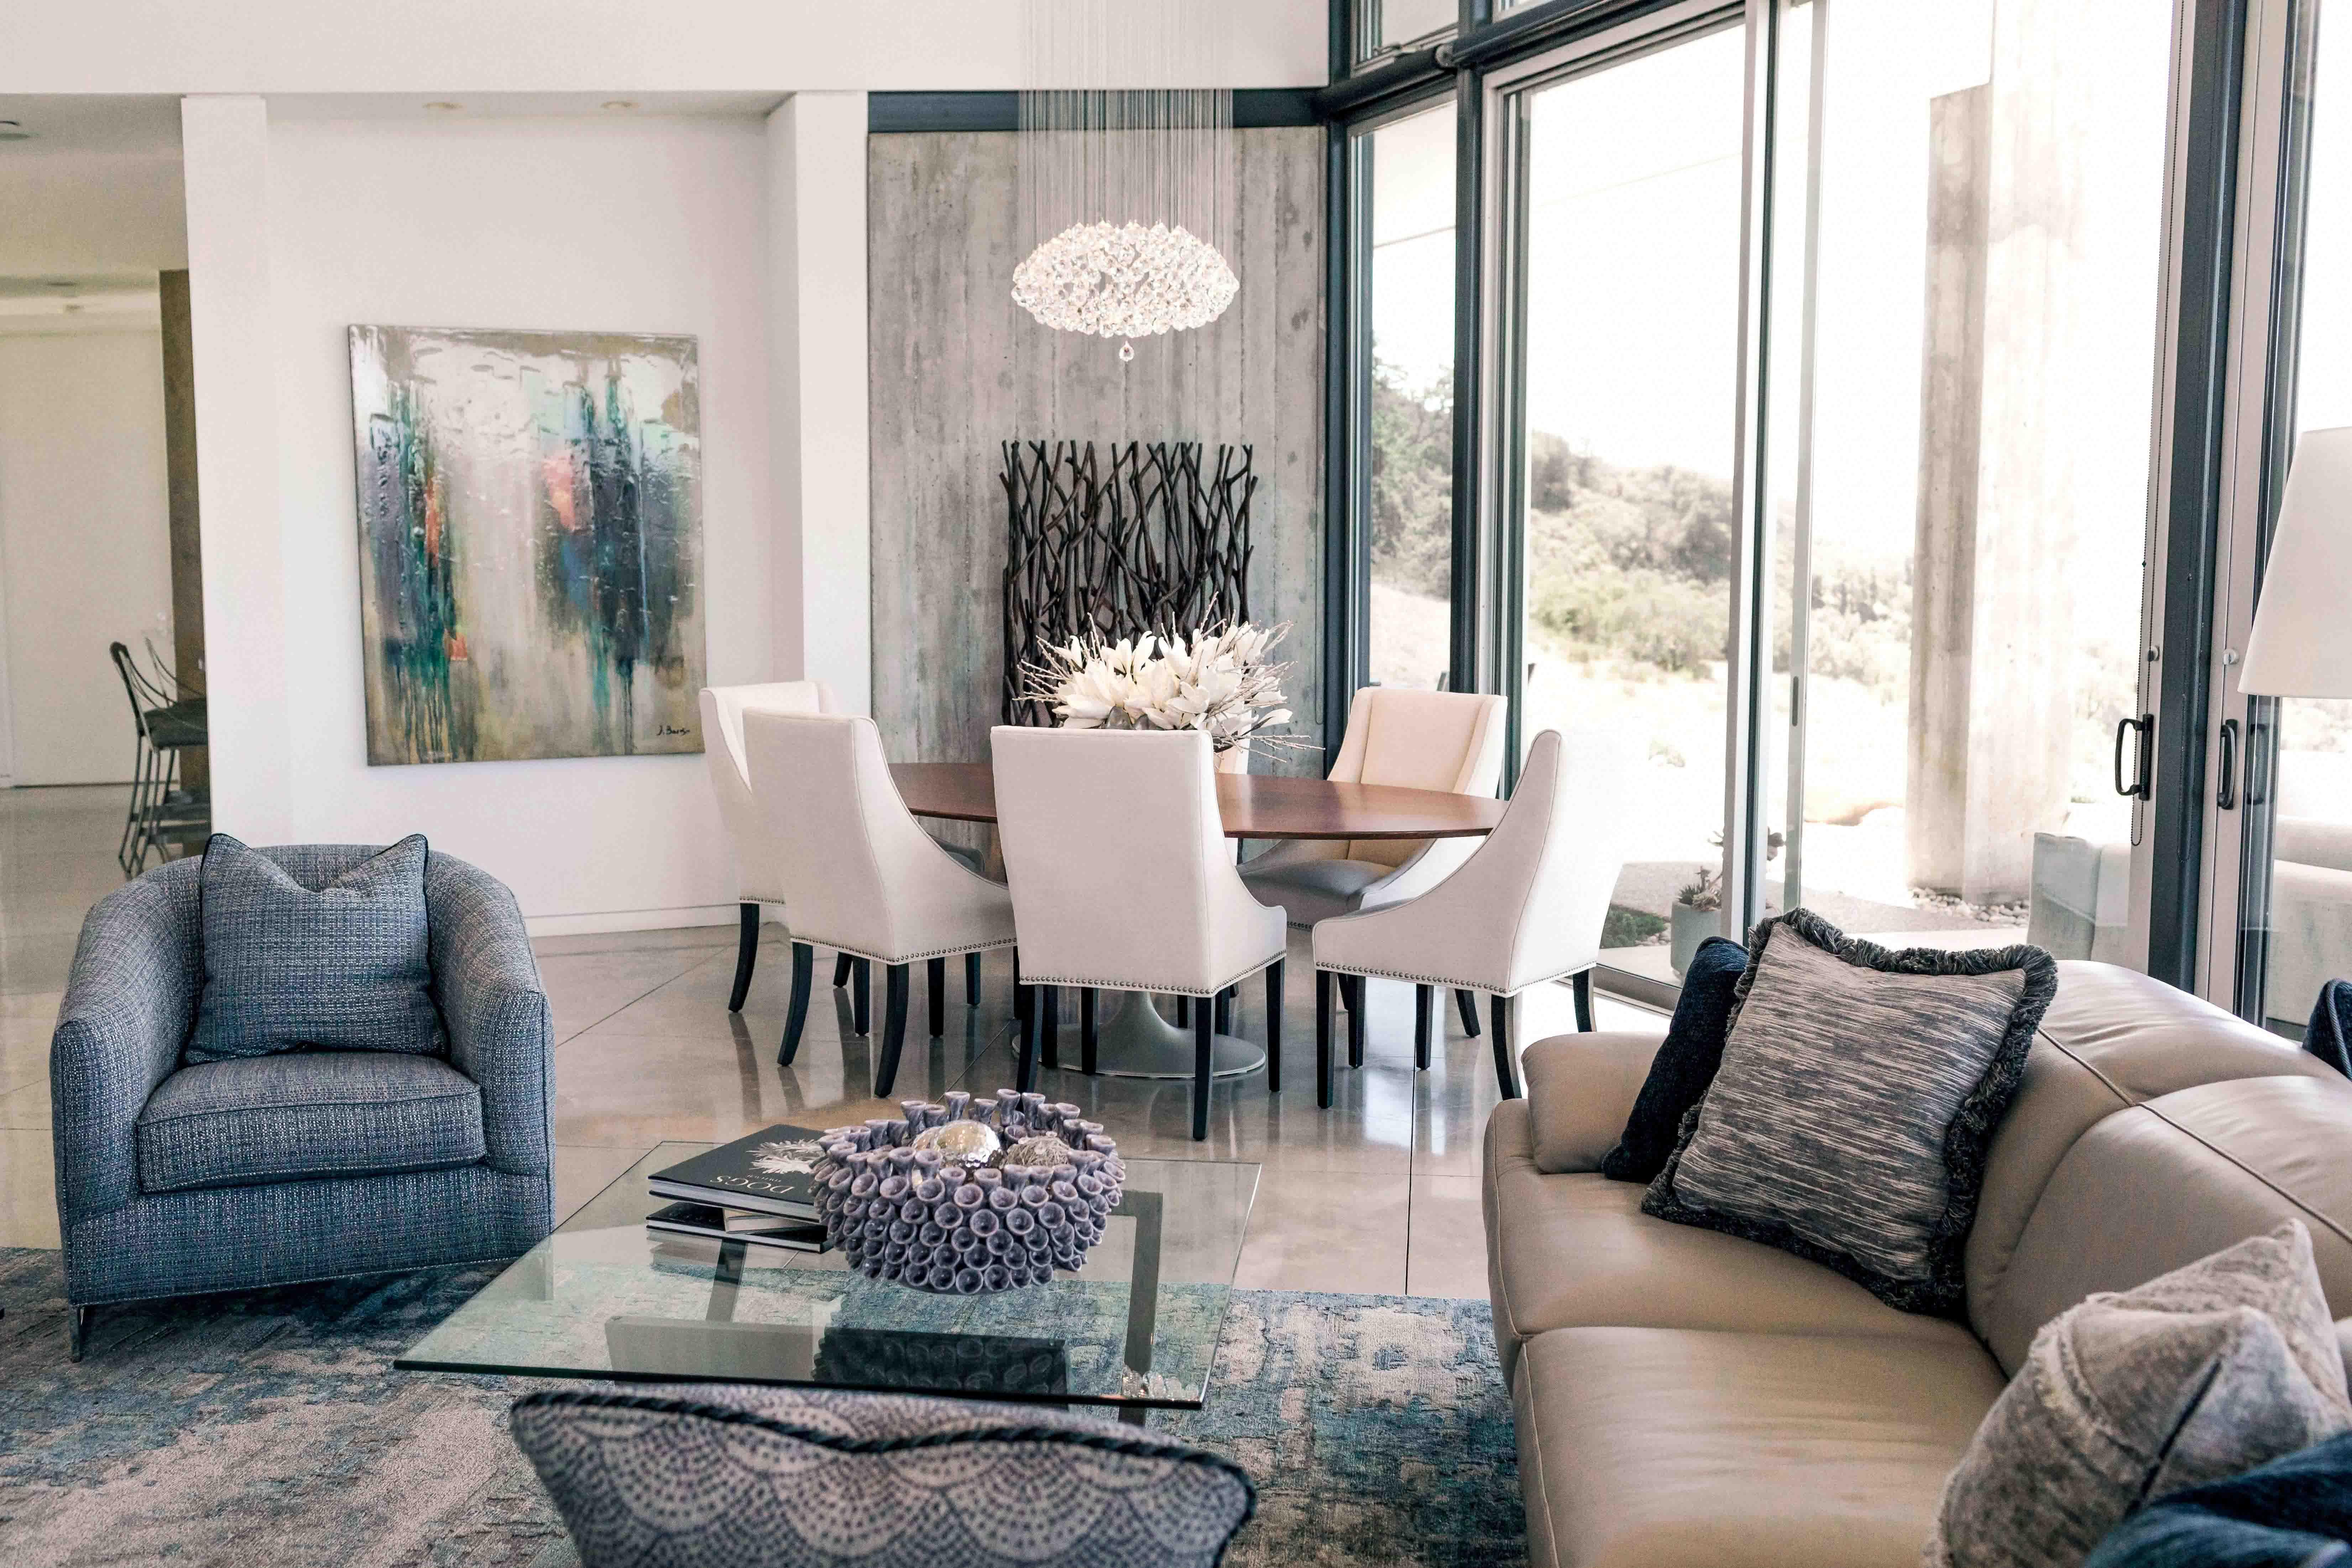 design works ltd a full service interior design agency in carmel